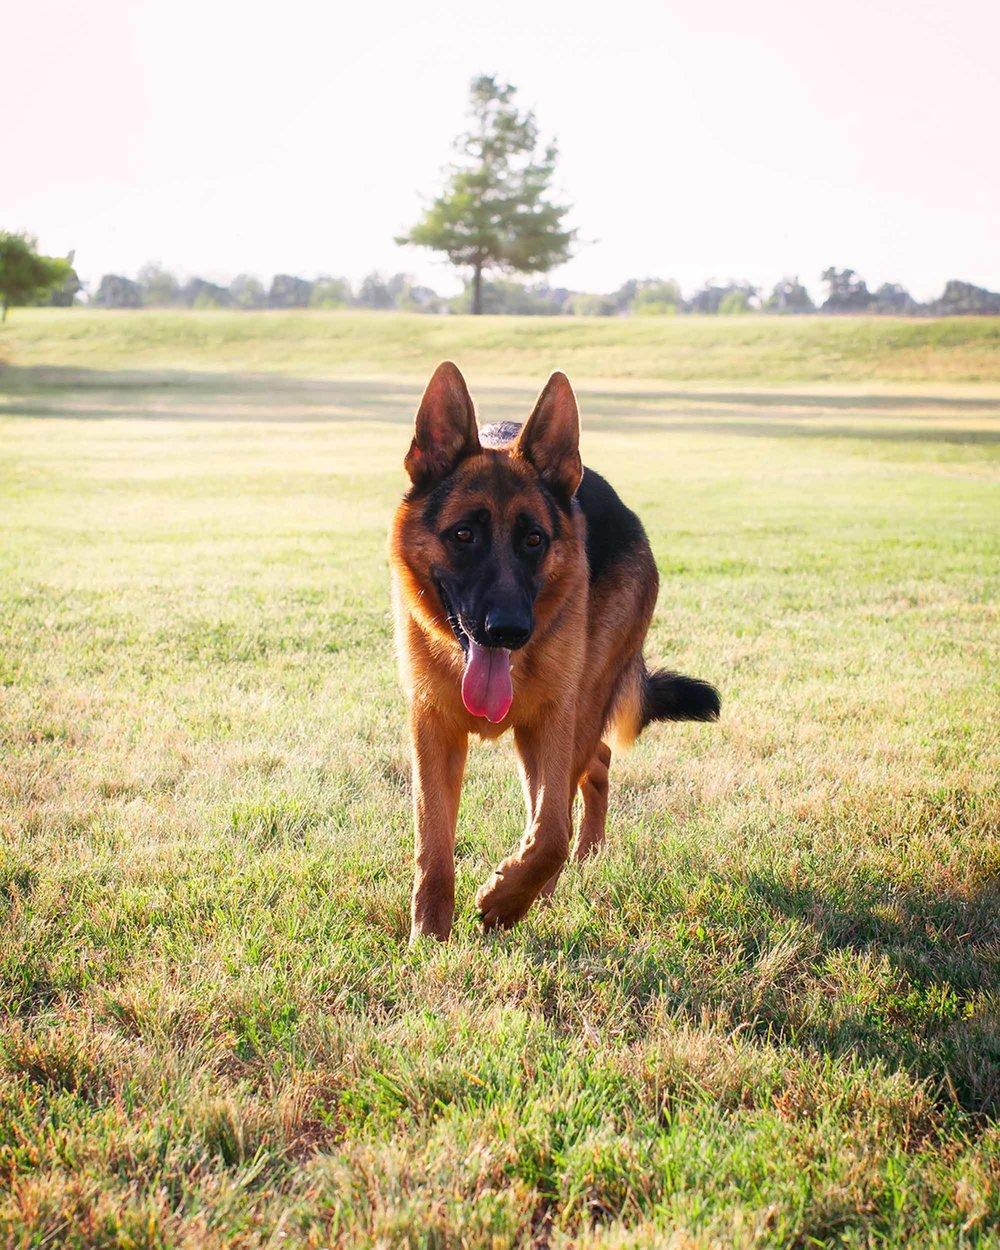 20150717-RnR-Dogs-8.jpg